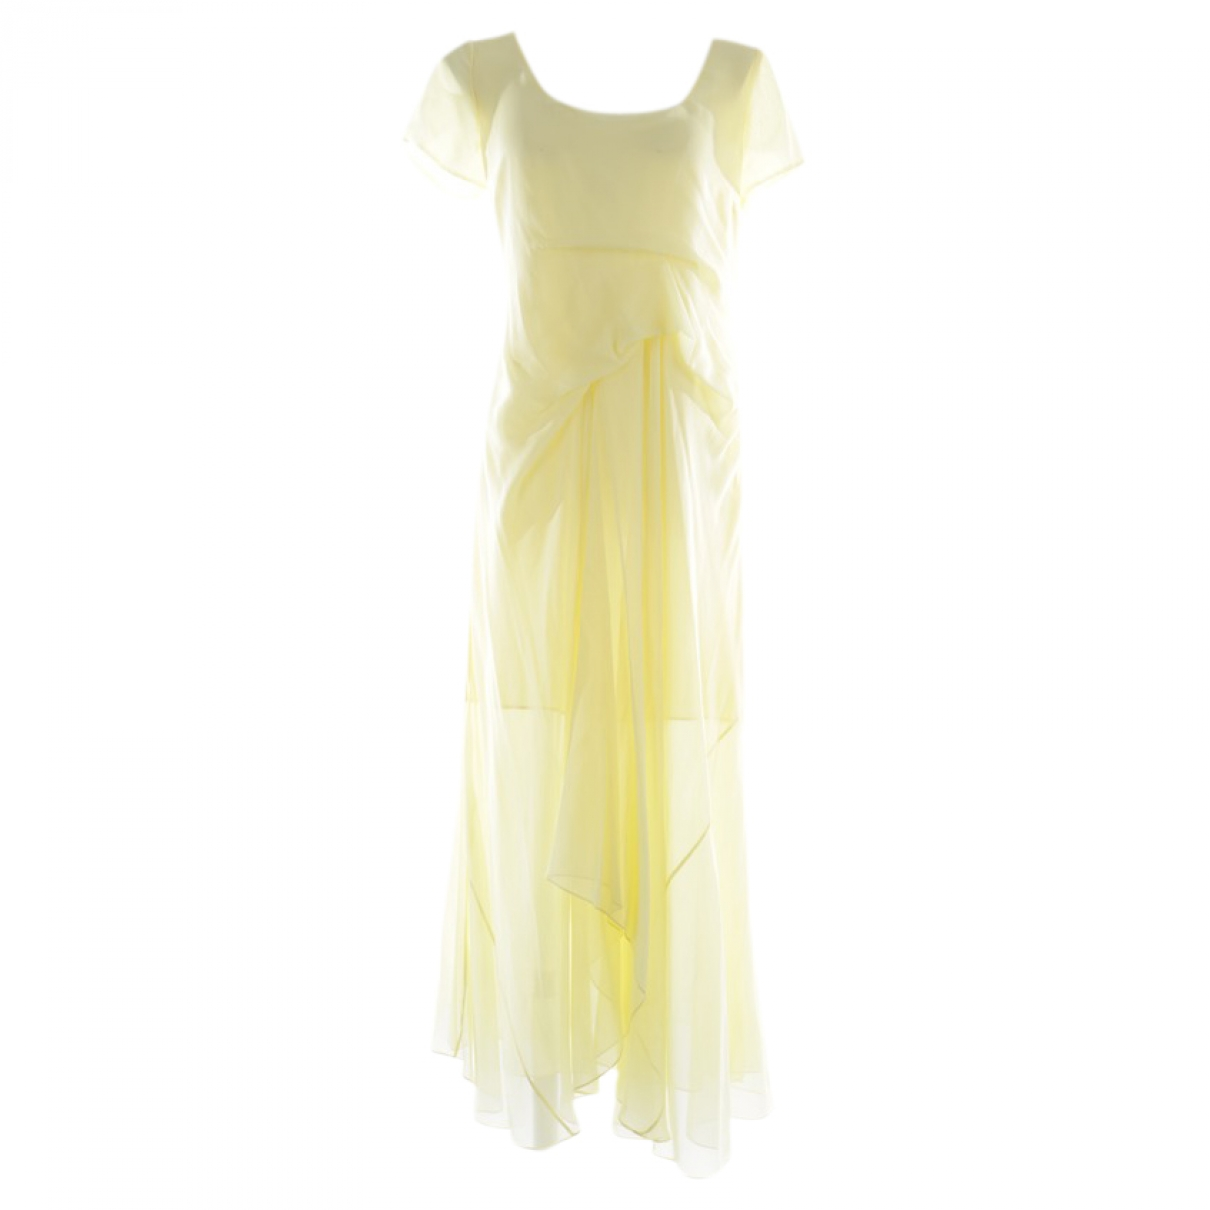 Sies Marjan - Robe   pour femme en soie - jaune